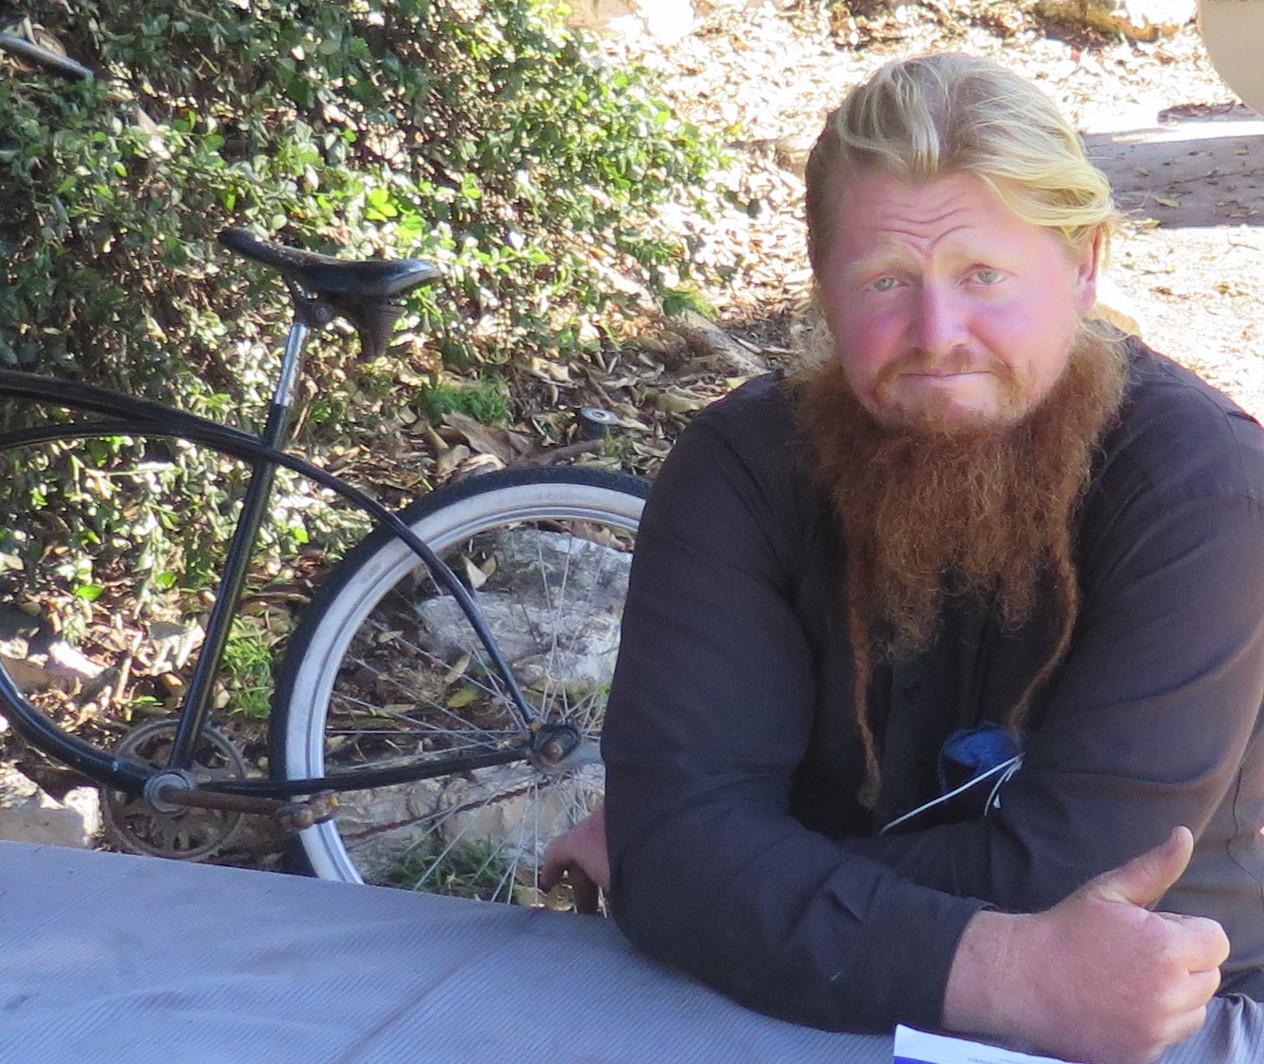 Gregory Thomas at Valley Park. Photo